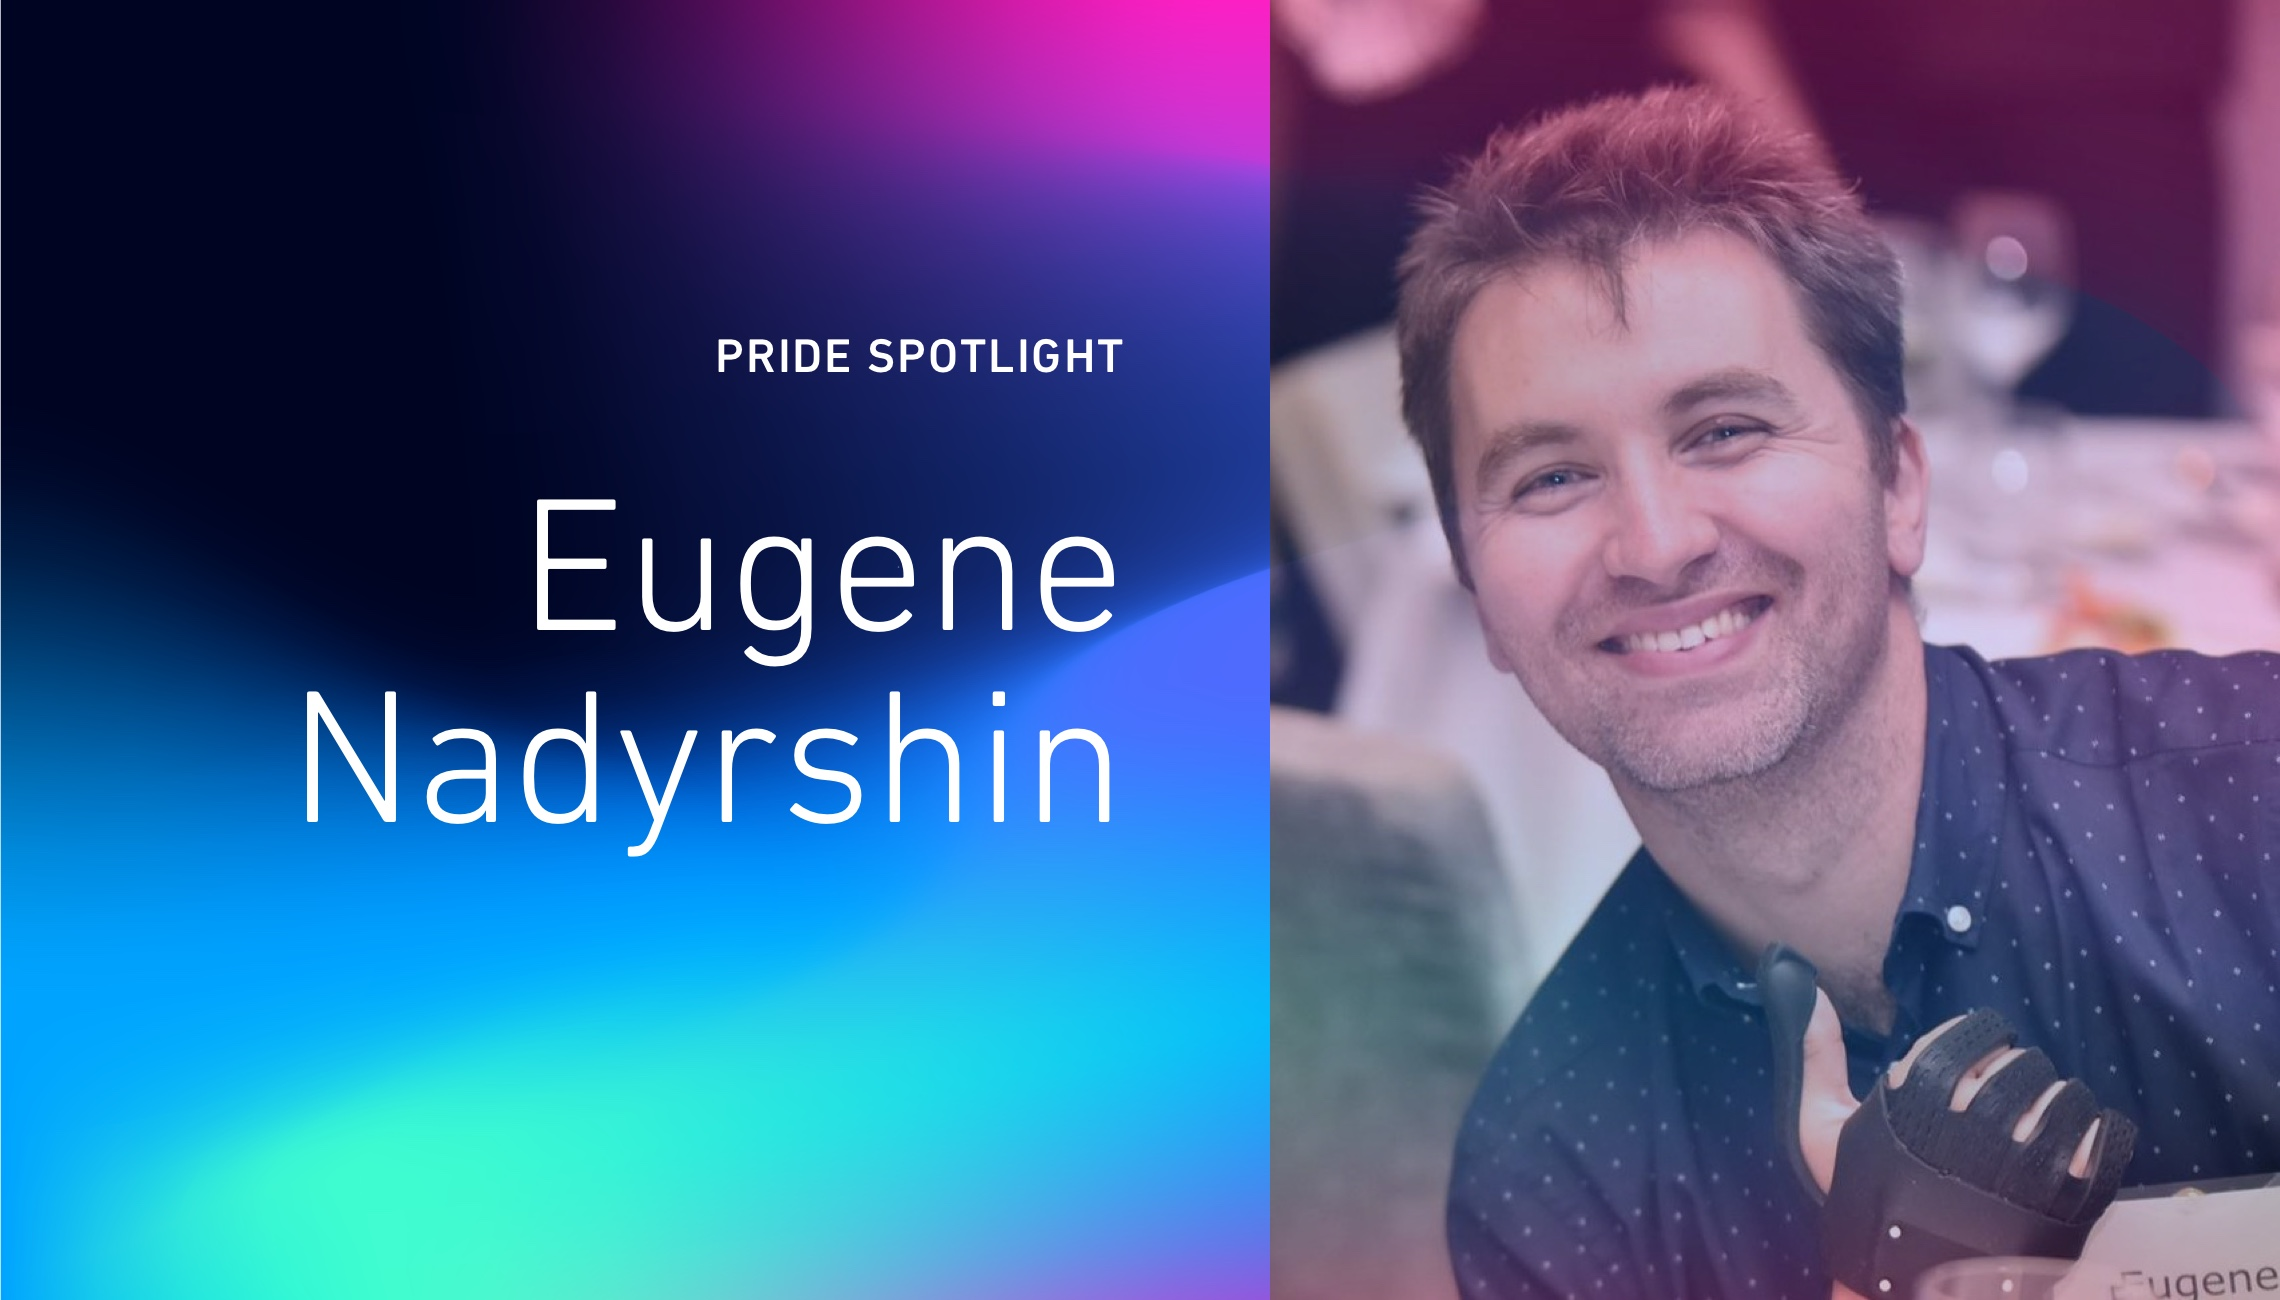 Pride Spotlight: Eugene Nadyrshin